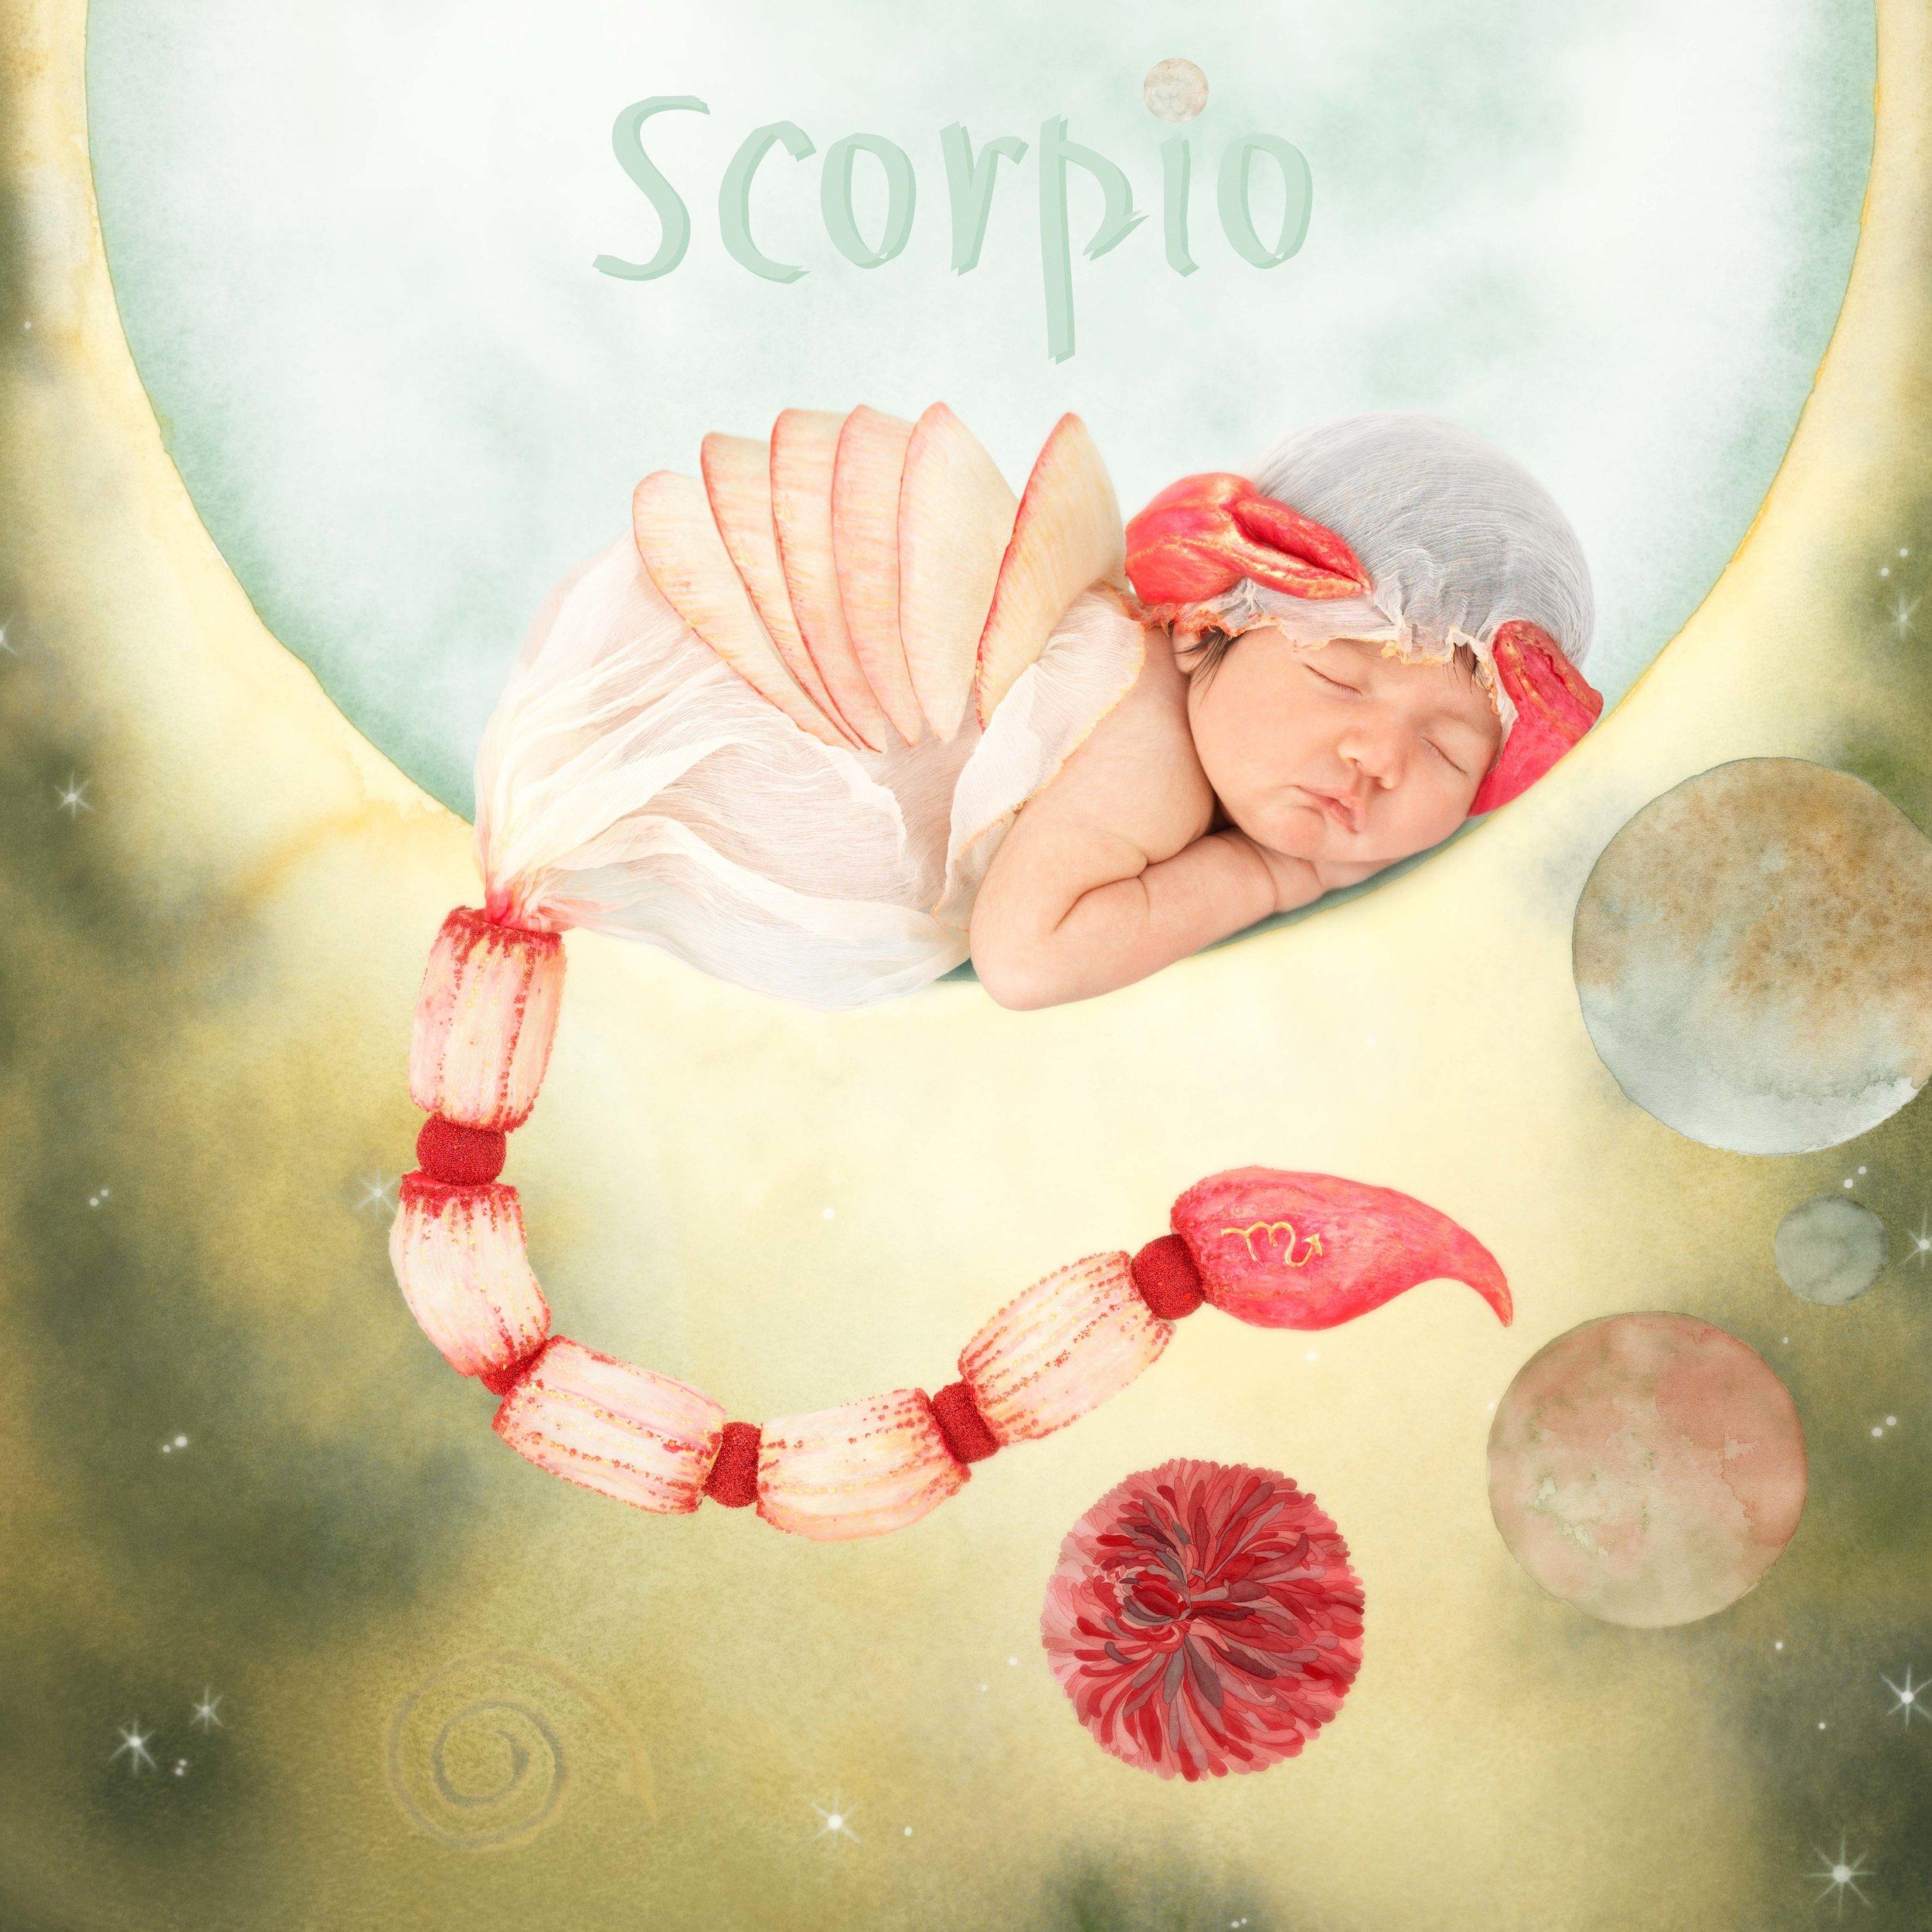 Scorpio_5mmBleed.jpg